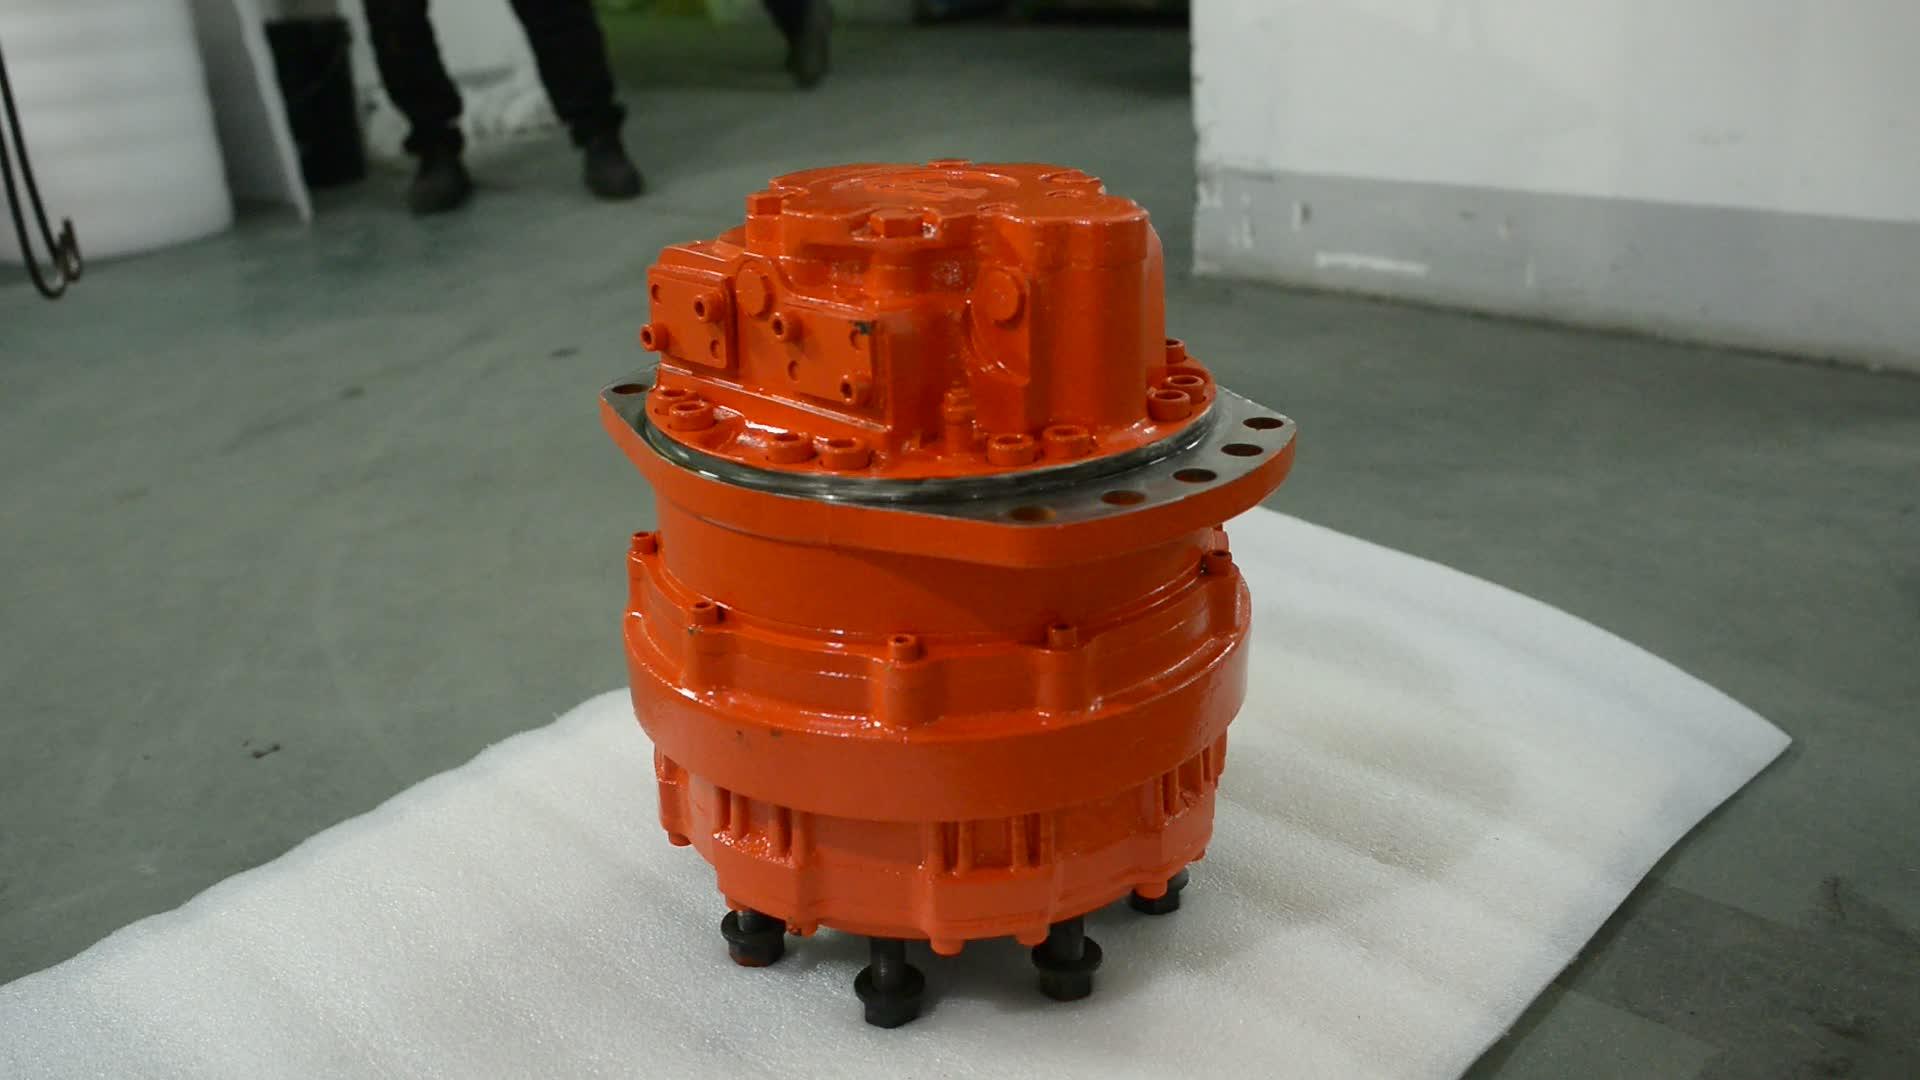 Rexroth MCR MCR3 MCR03 MCRE03 MCR5 MCR05 MCRE05 MCR10 MCRE10 hydraulic motor and parts for skid steer loader